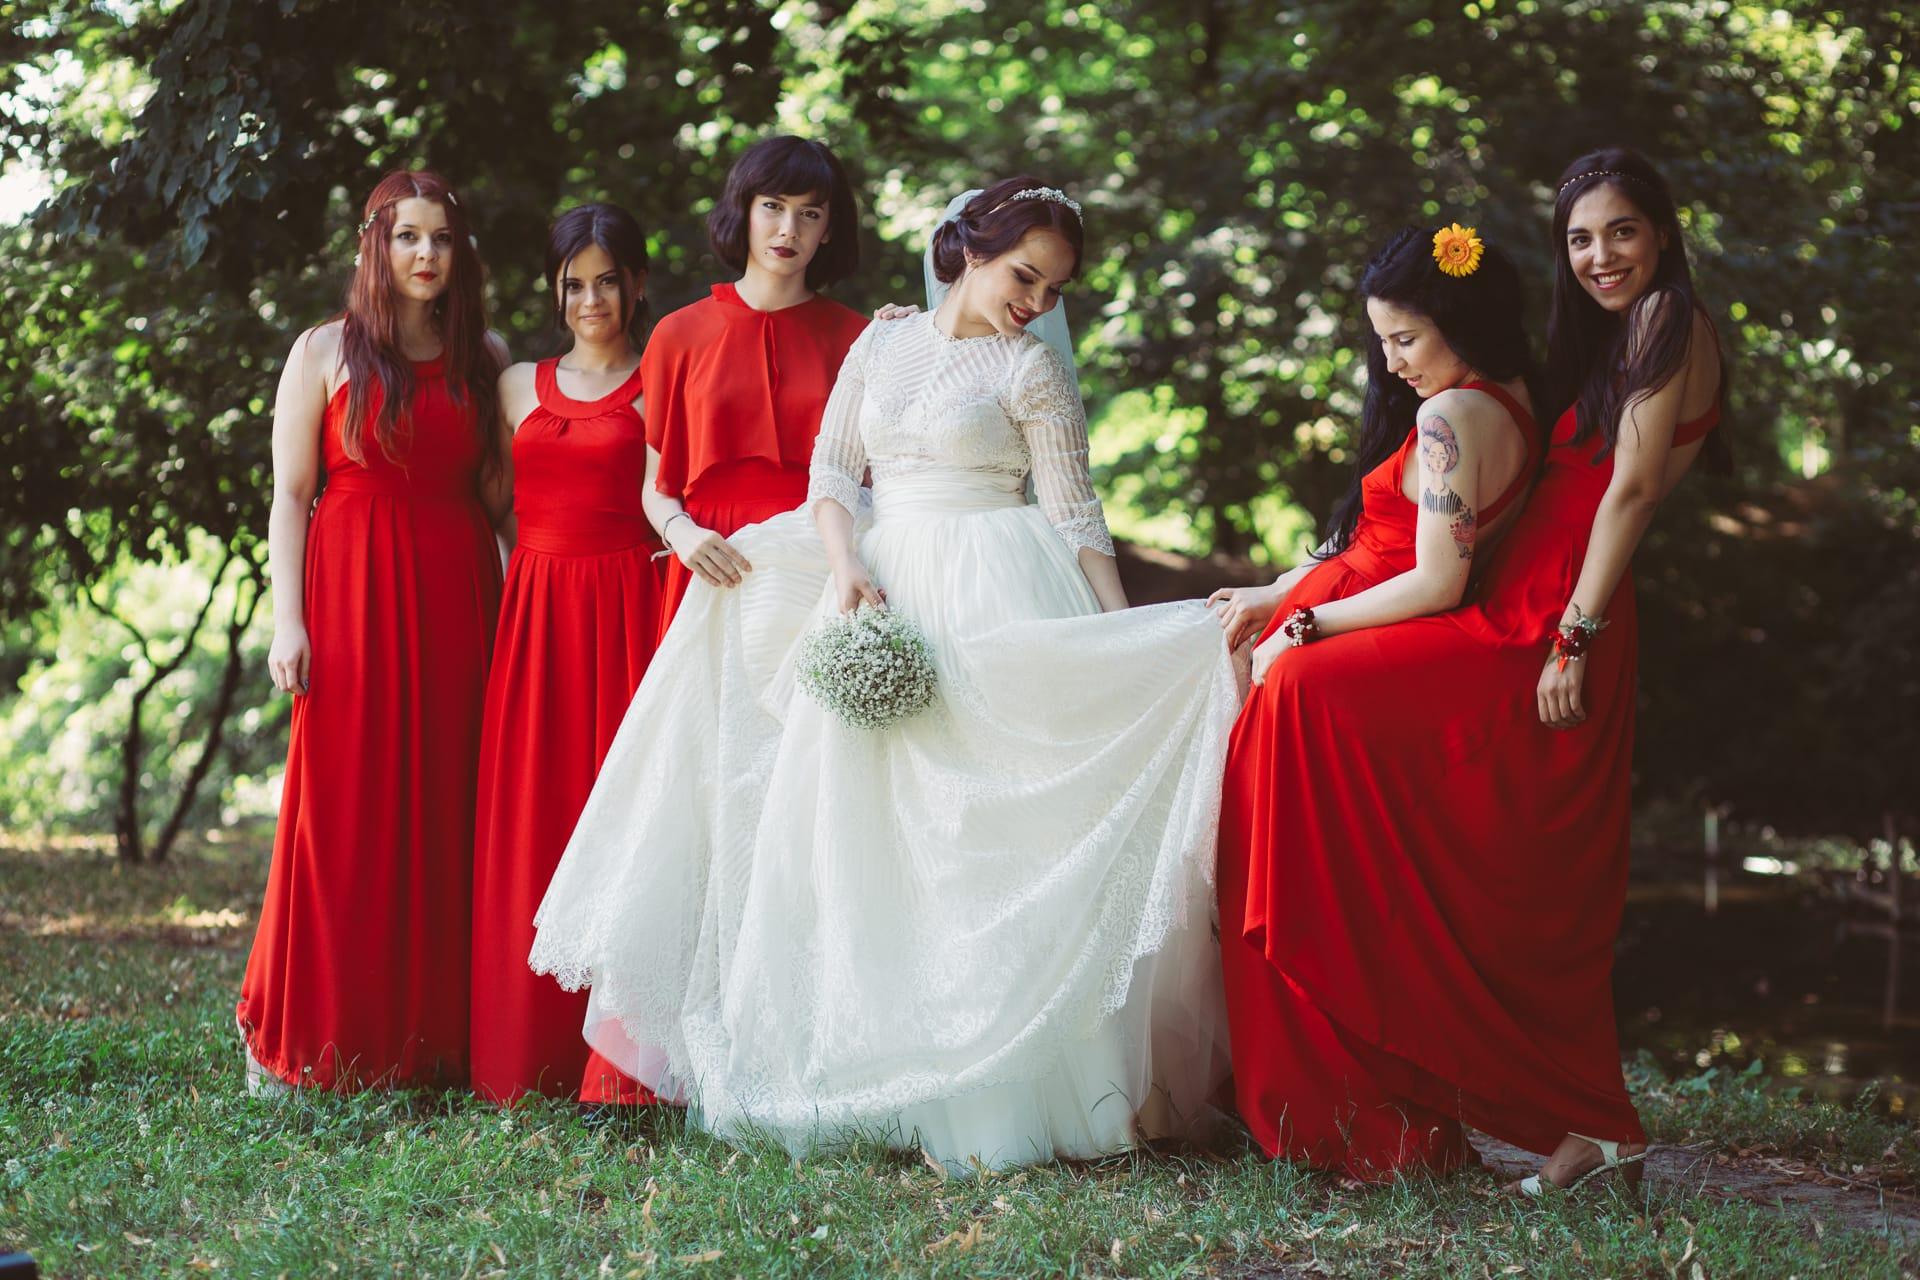 fotograf nunta craiova dragos stoenica raluca si andrei 0258